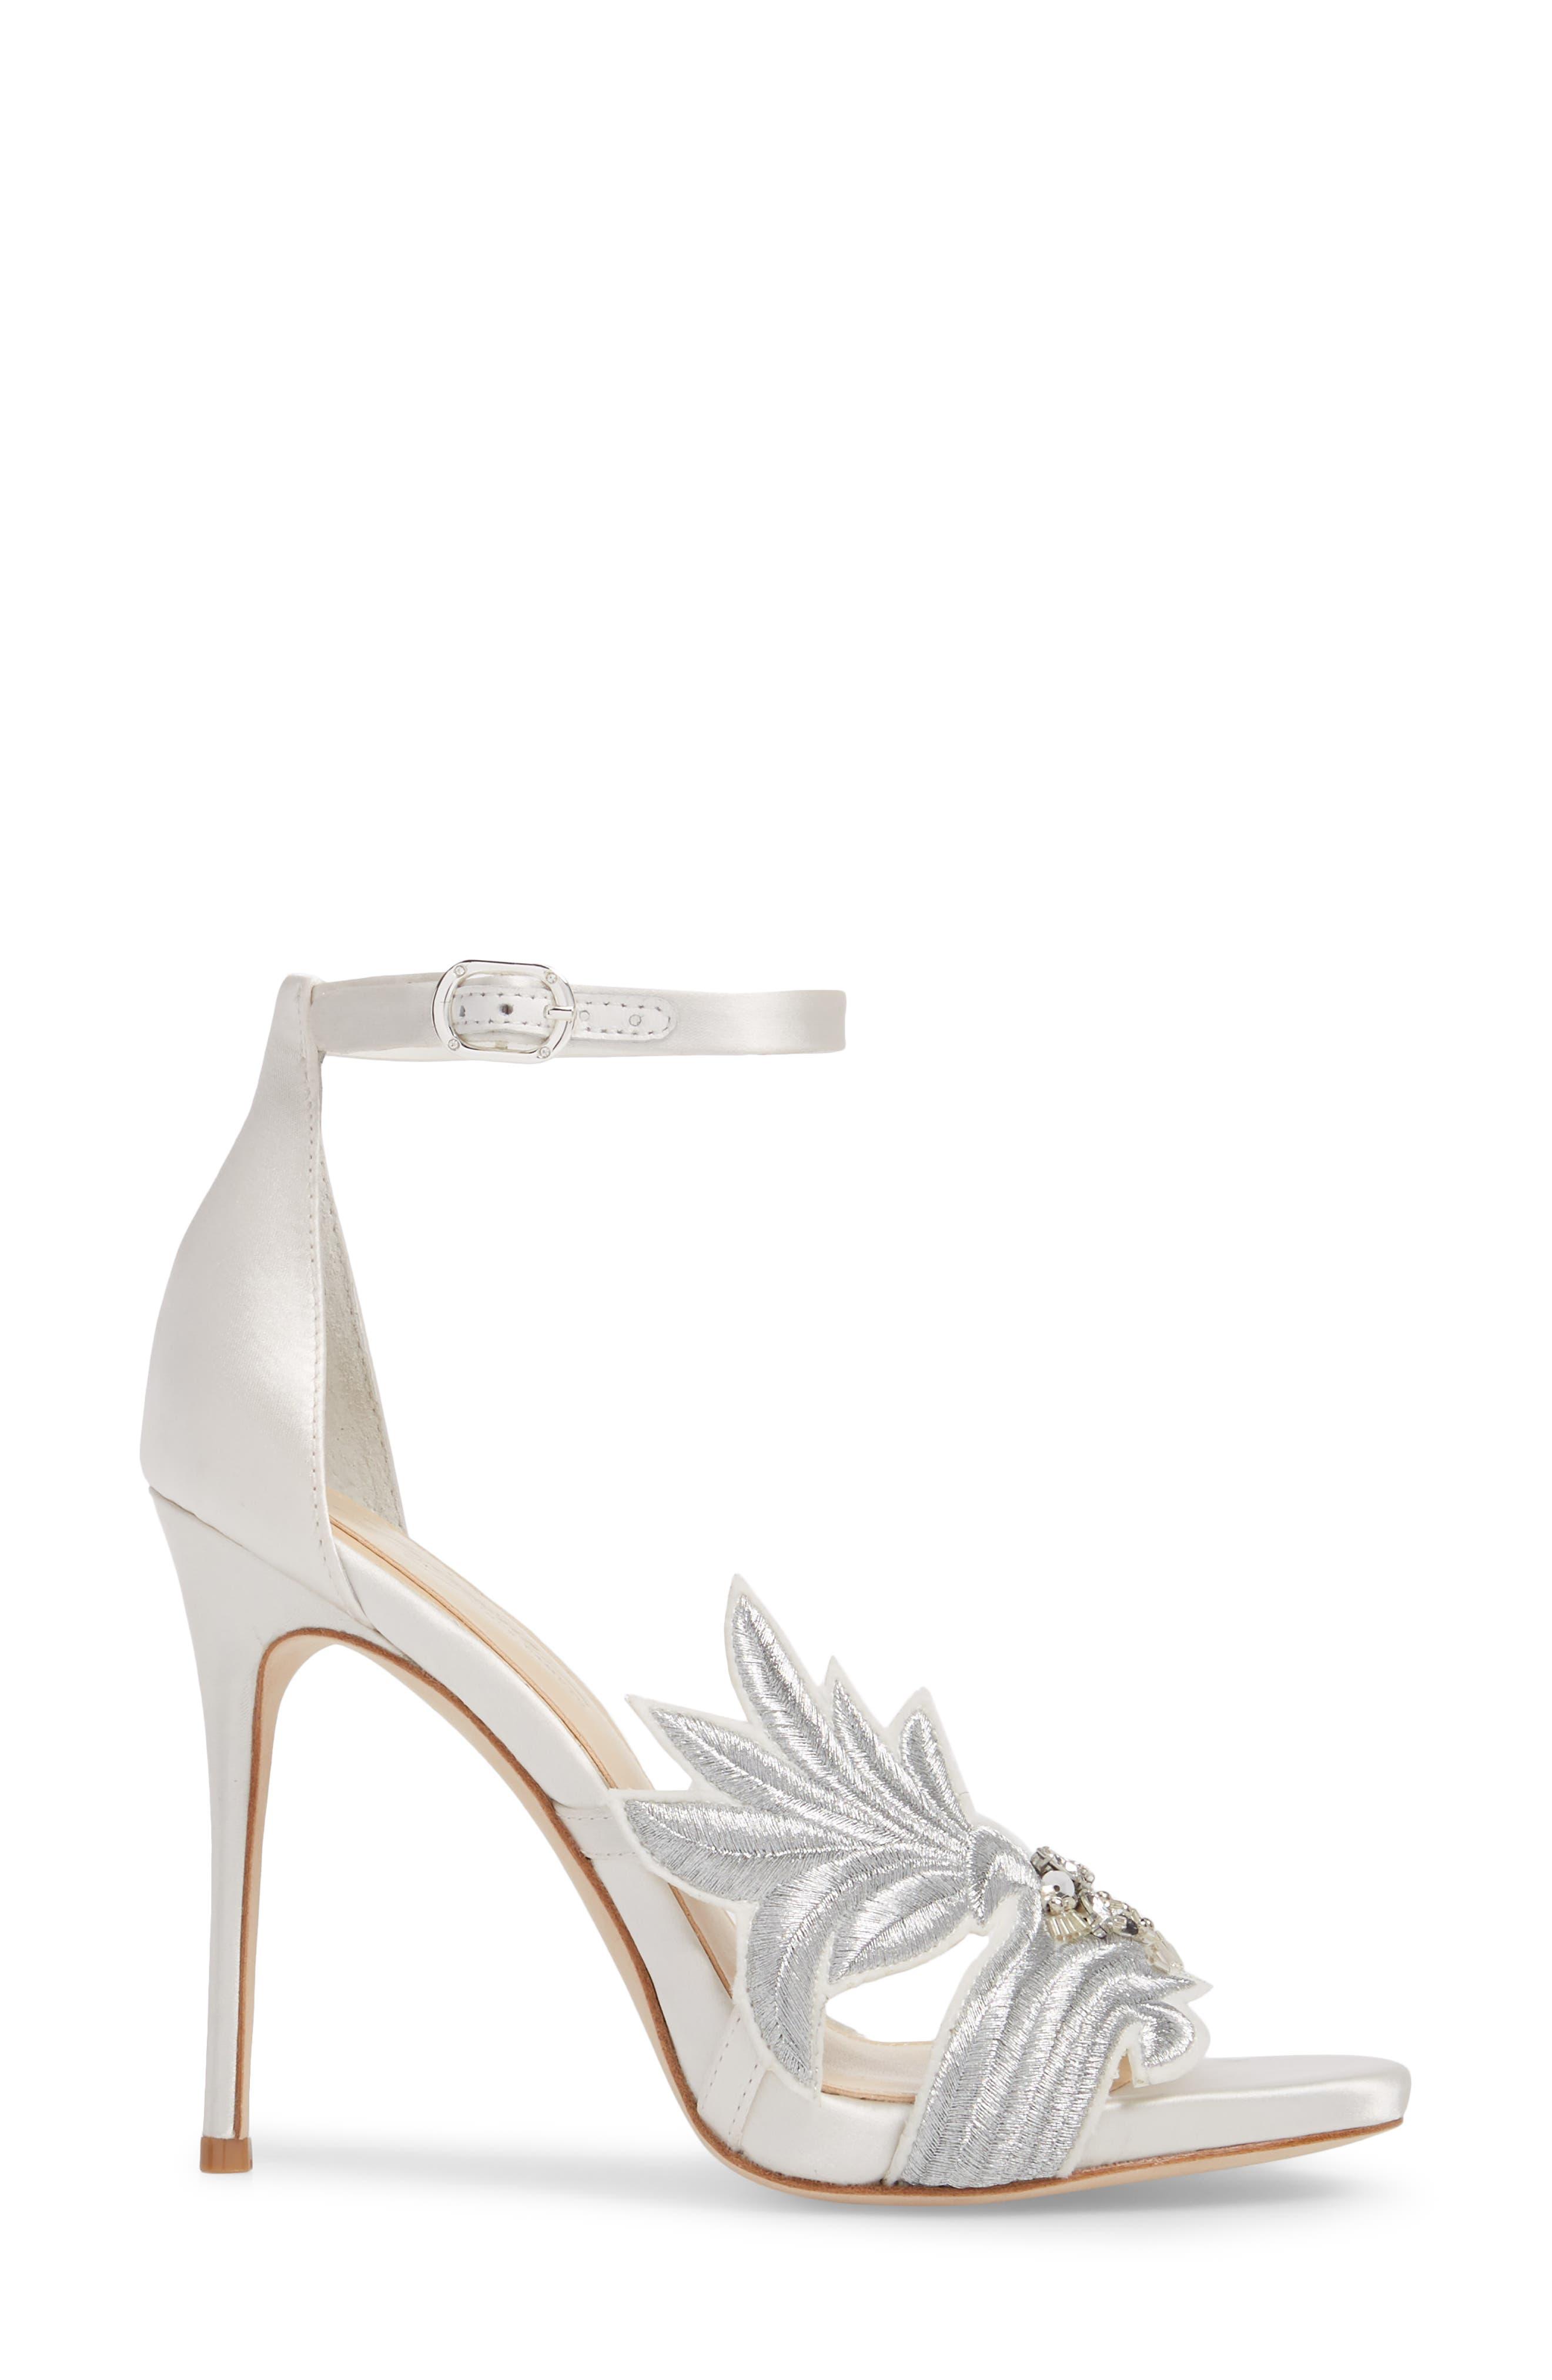 Imagine Vince Camuto Dayanara Embellished Sandal,                             Alternate thumbnail 3, color,                             PURE WHITE SATIN